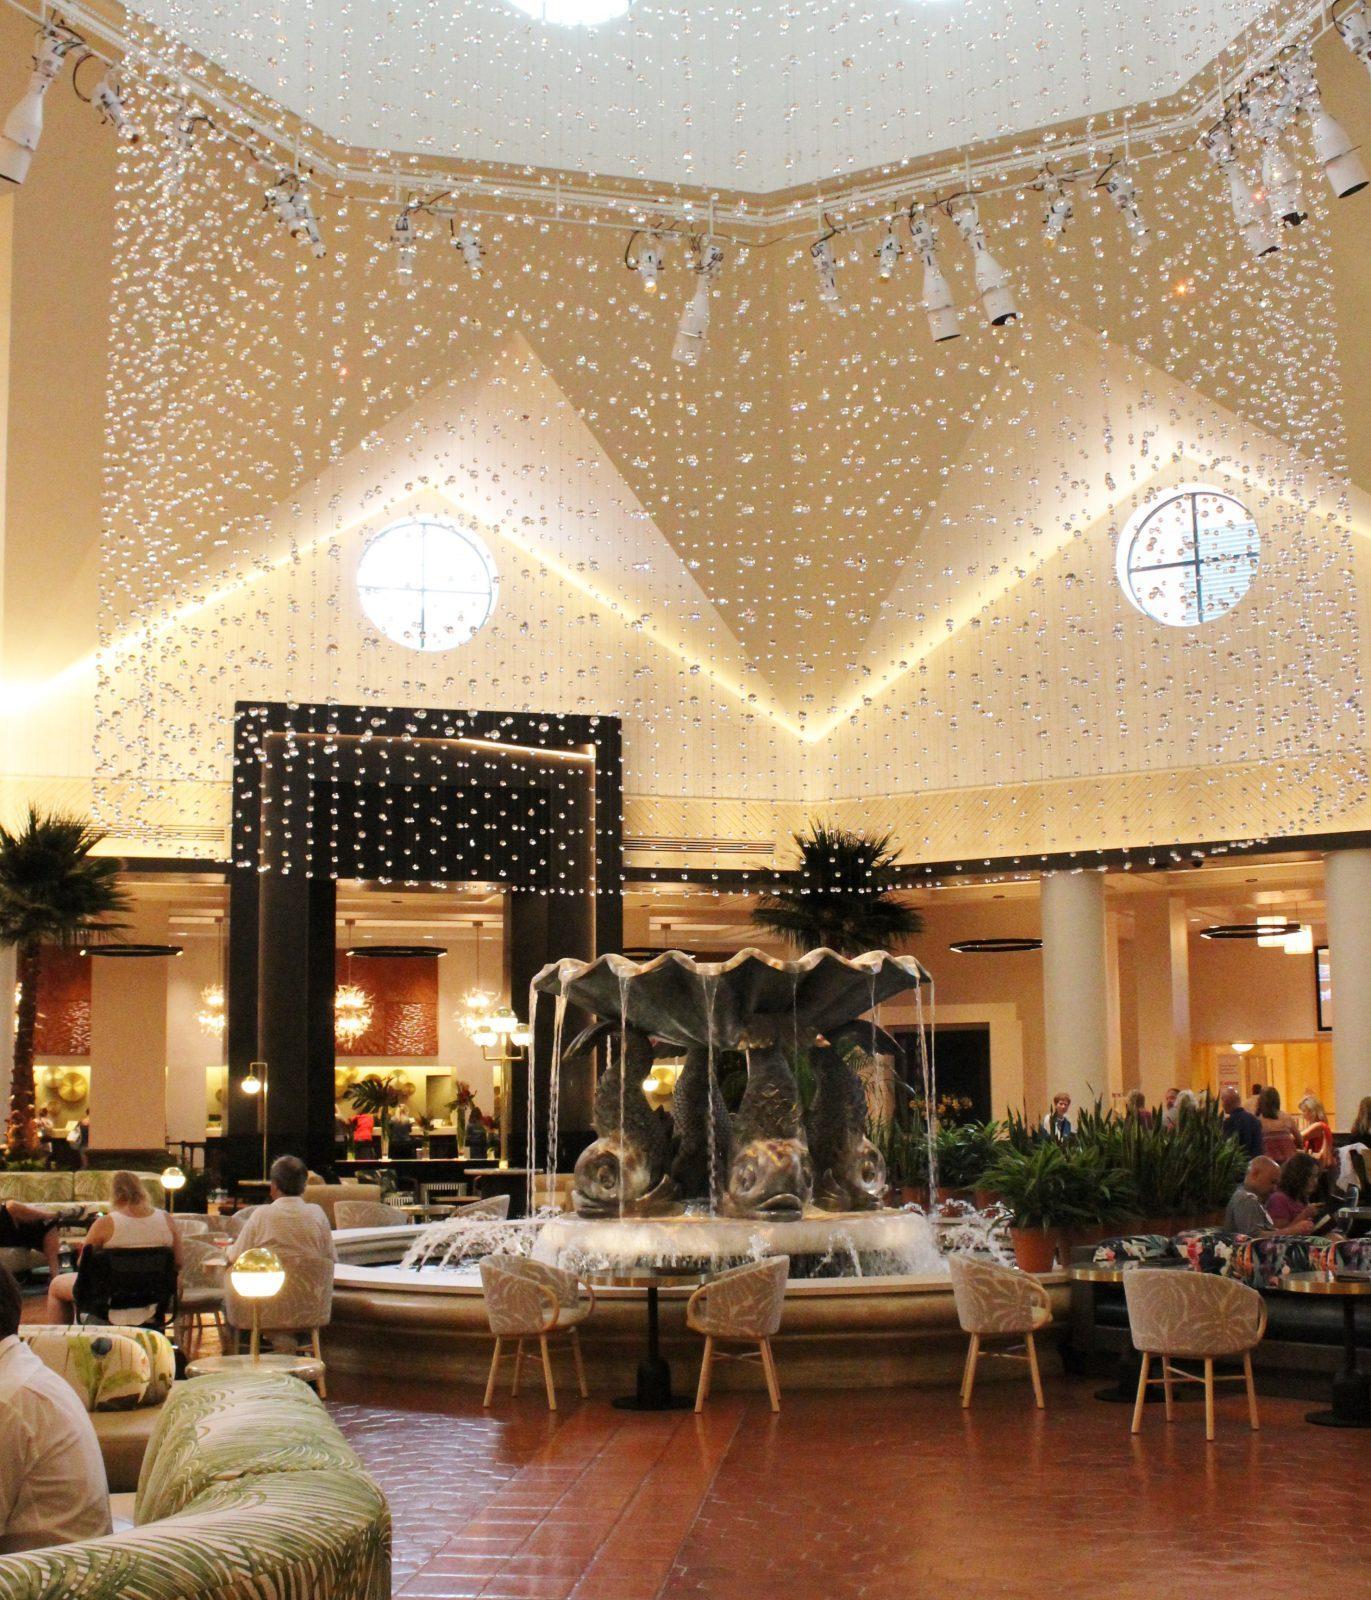 fountain in lobby area